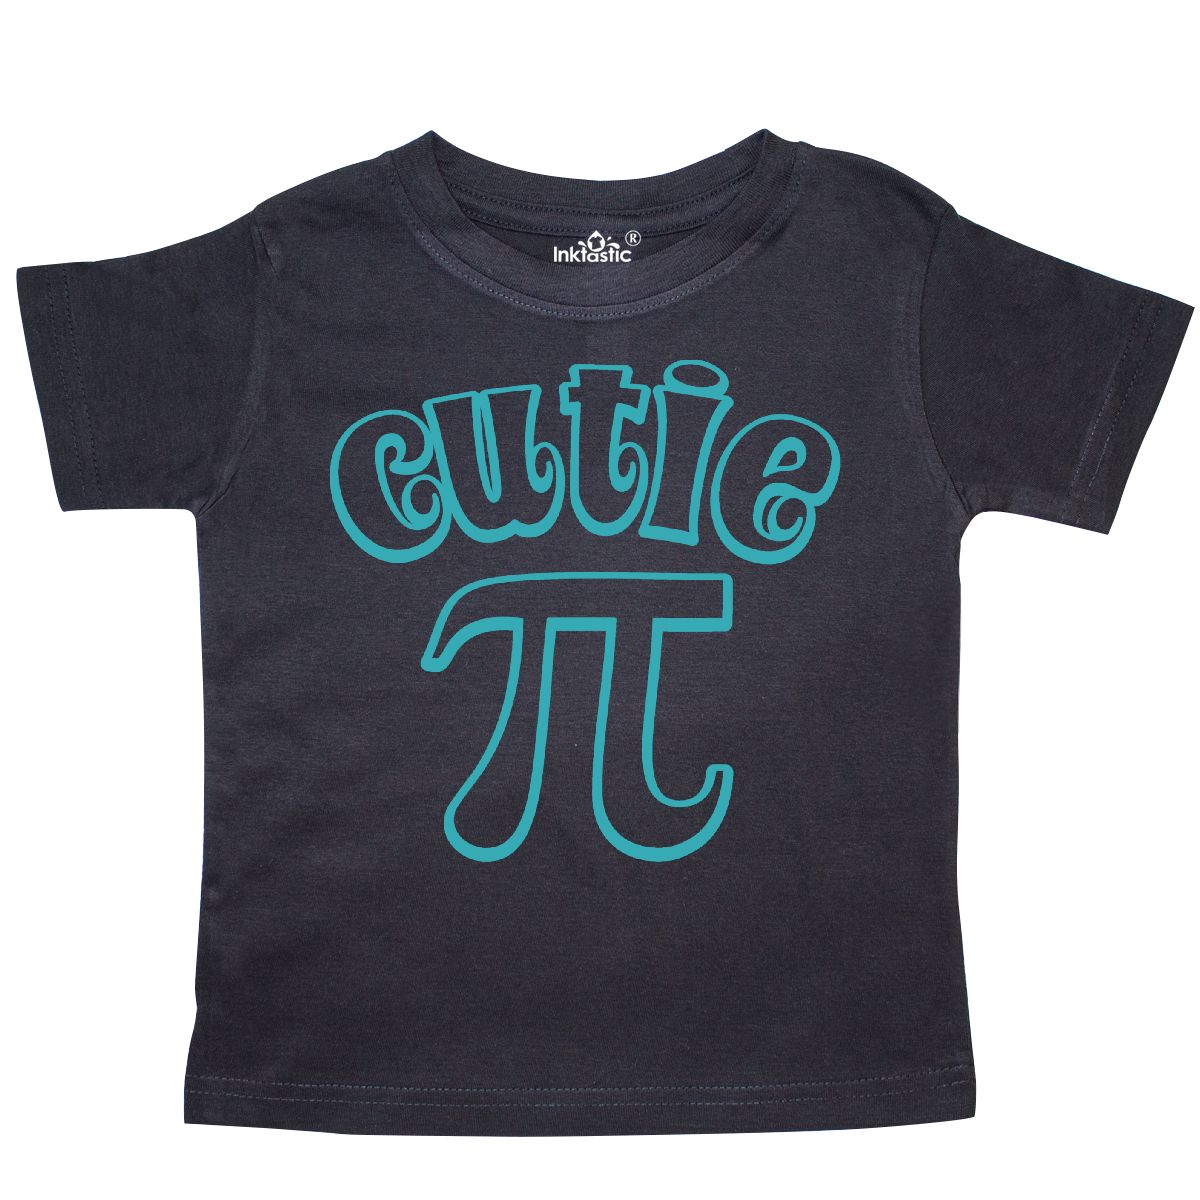 Inktastic Cutie Pi Toddler T-Shirt Nerd Geek Funny Pie Baby Laughs Humor Gift